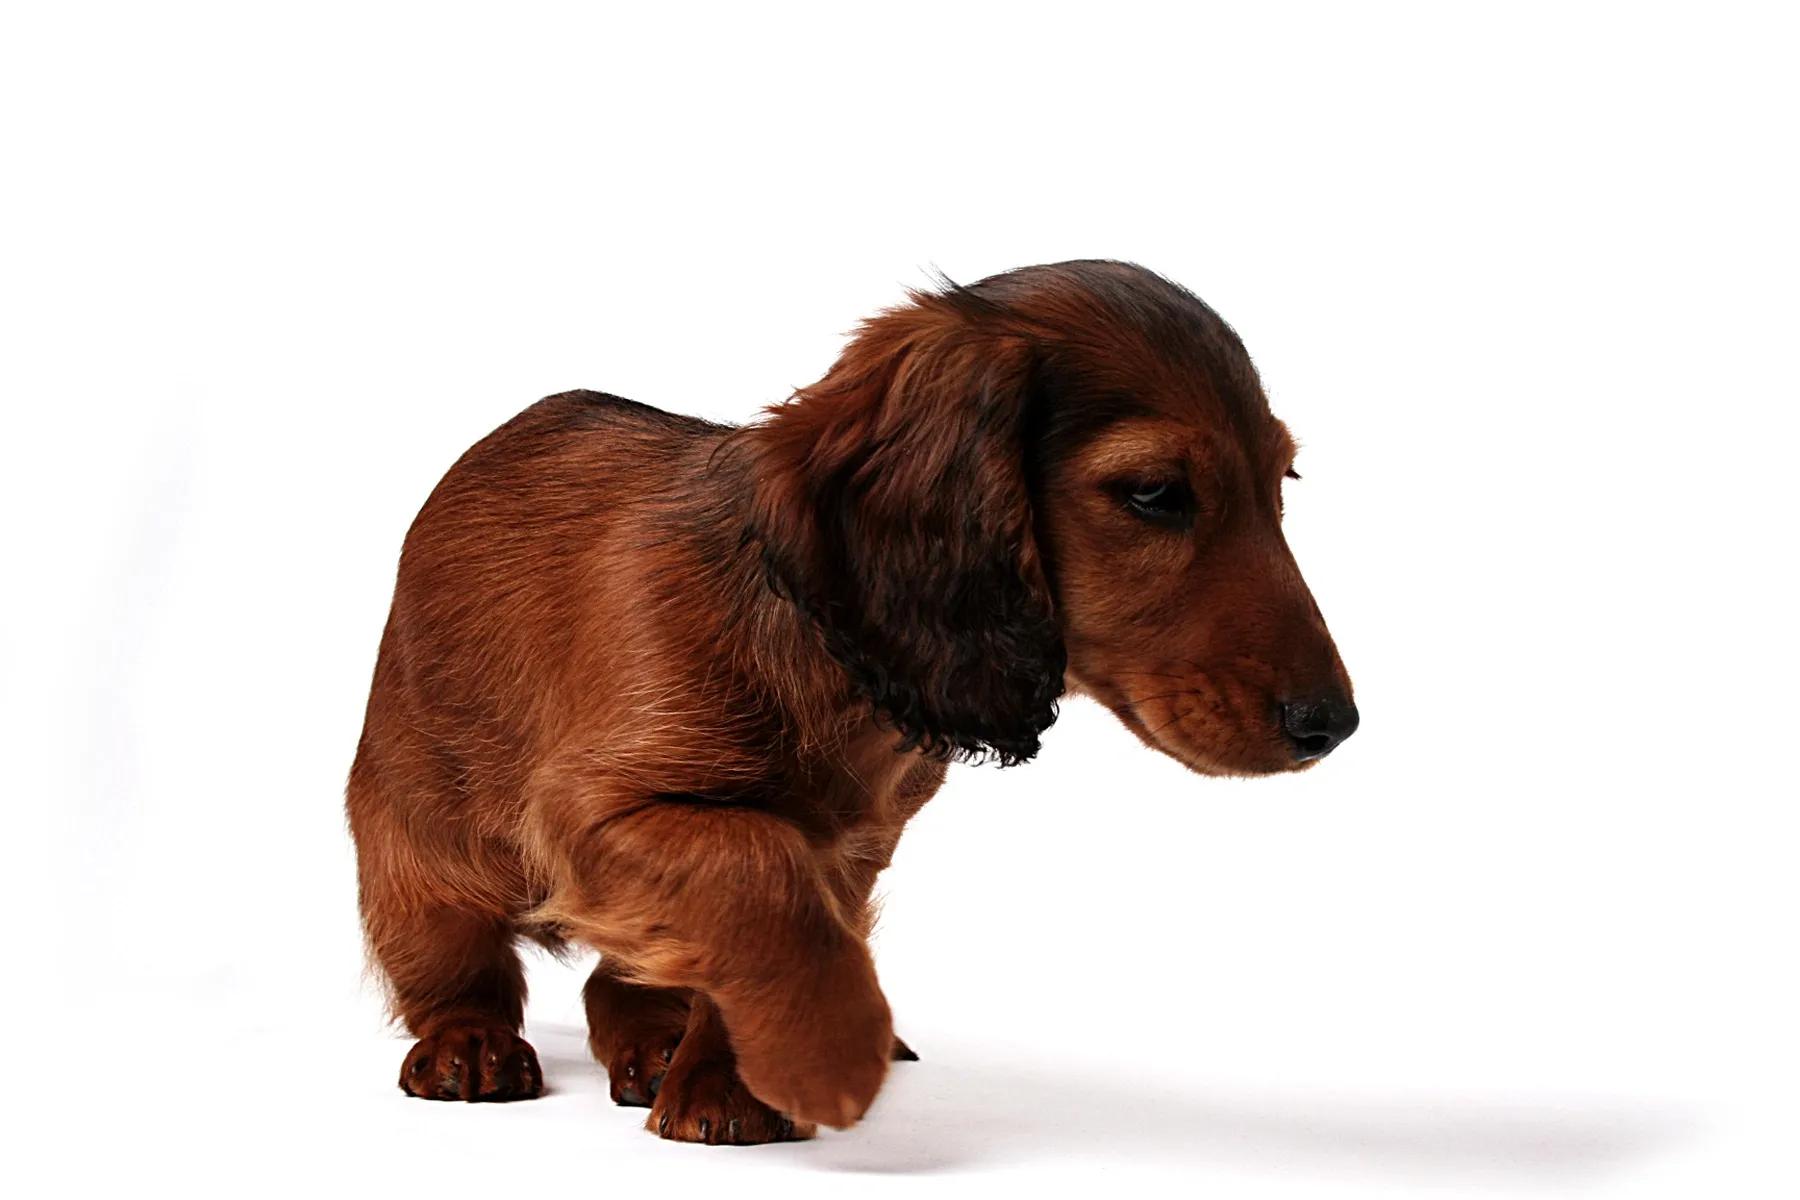 Brown Dachshund pup